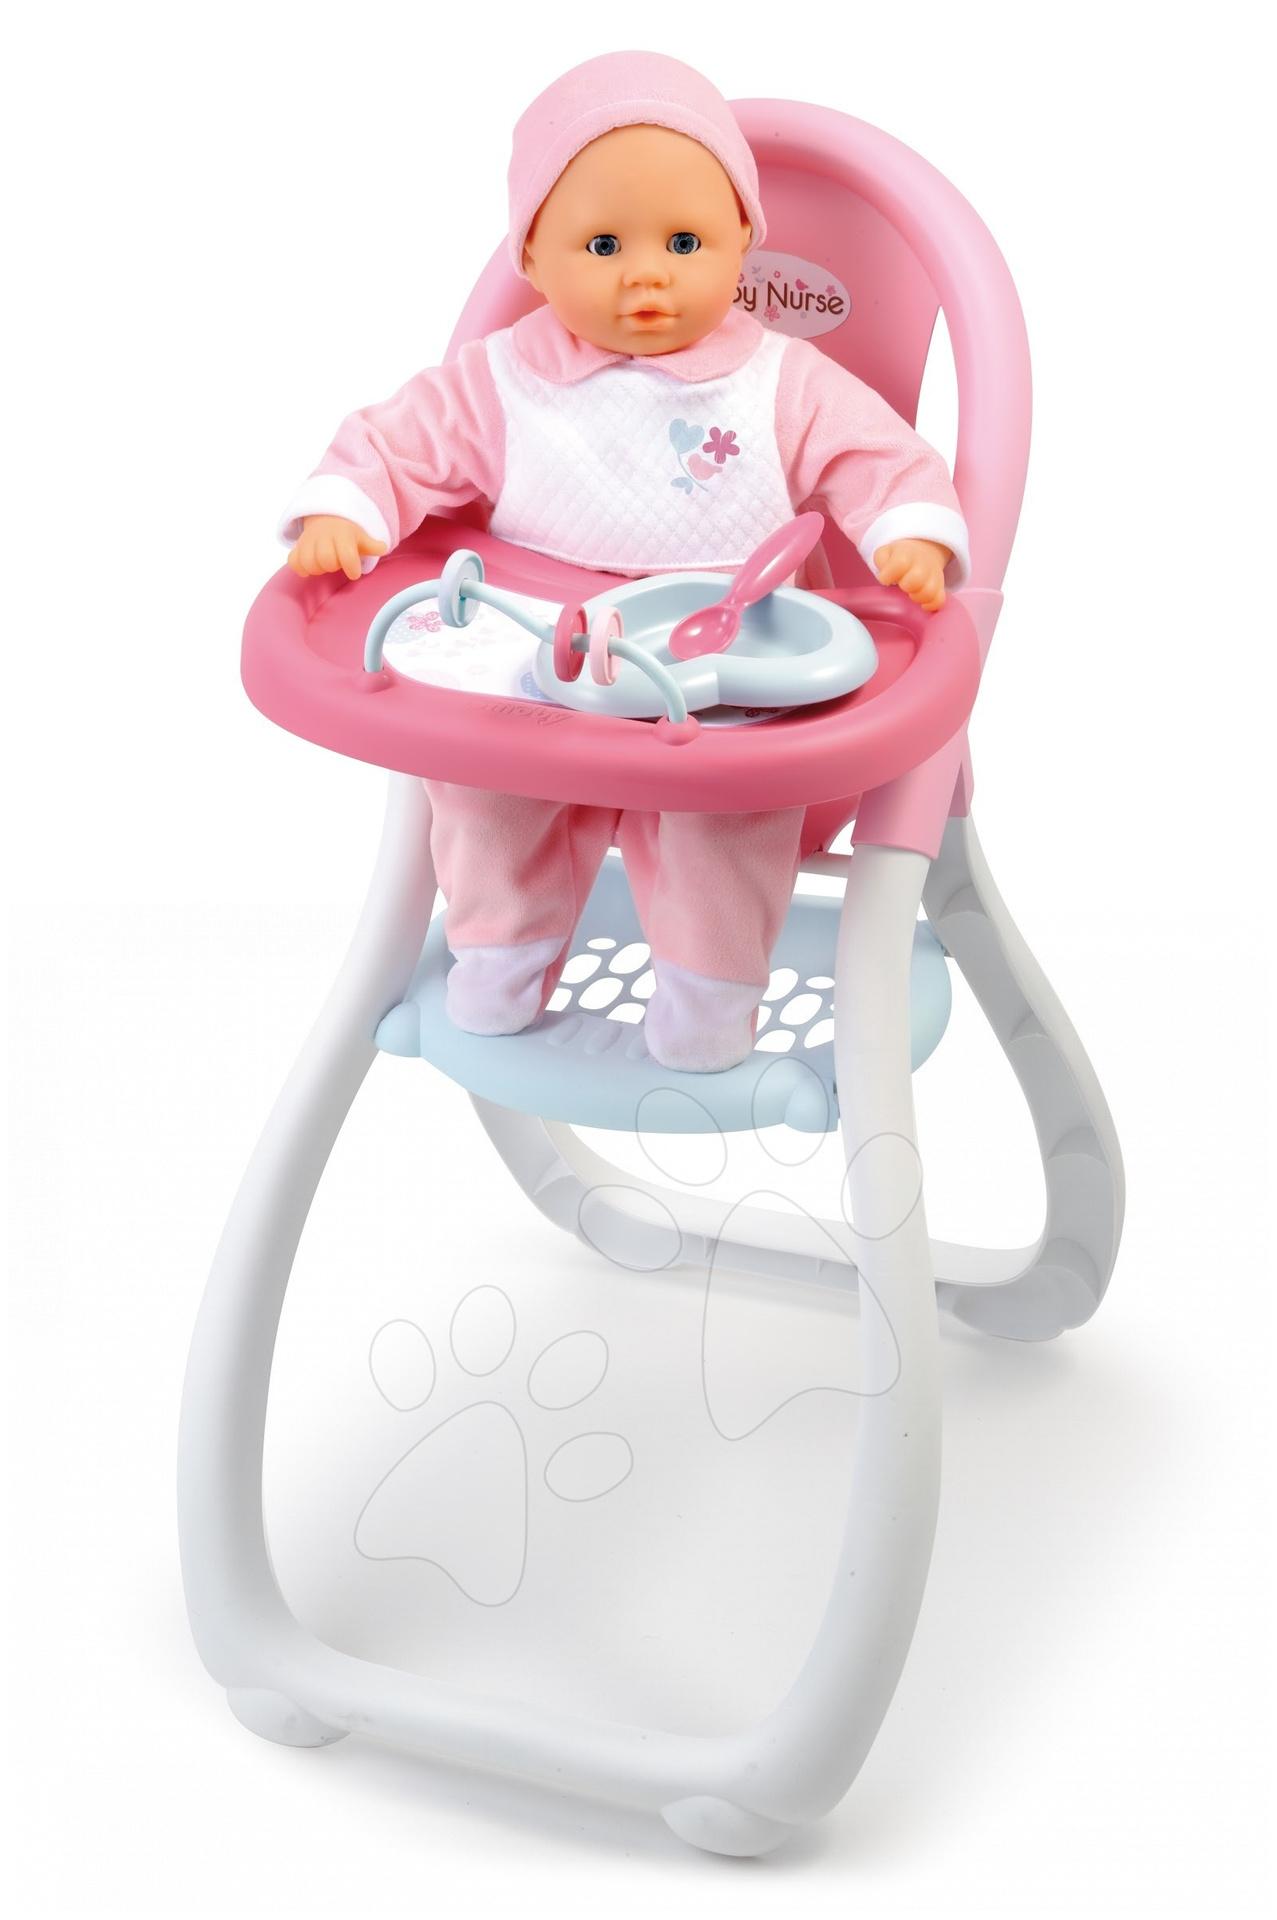 Jedálenská stolička Baby Nurse Smoby pre 42 cm bábiku od 18 mes